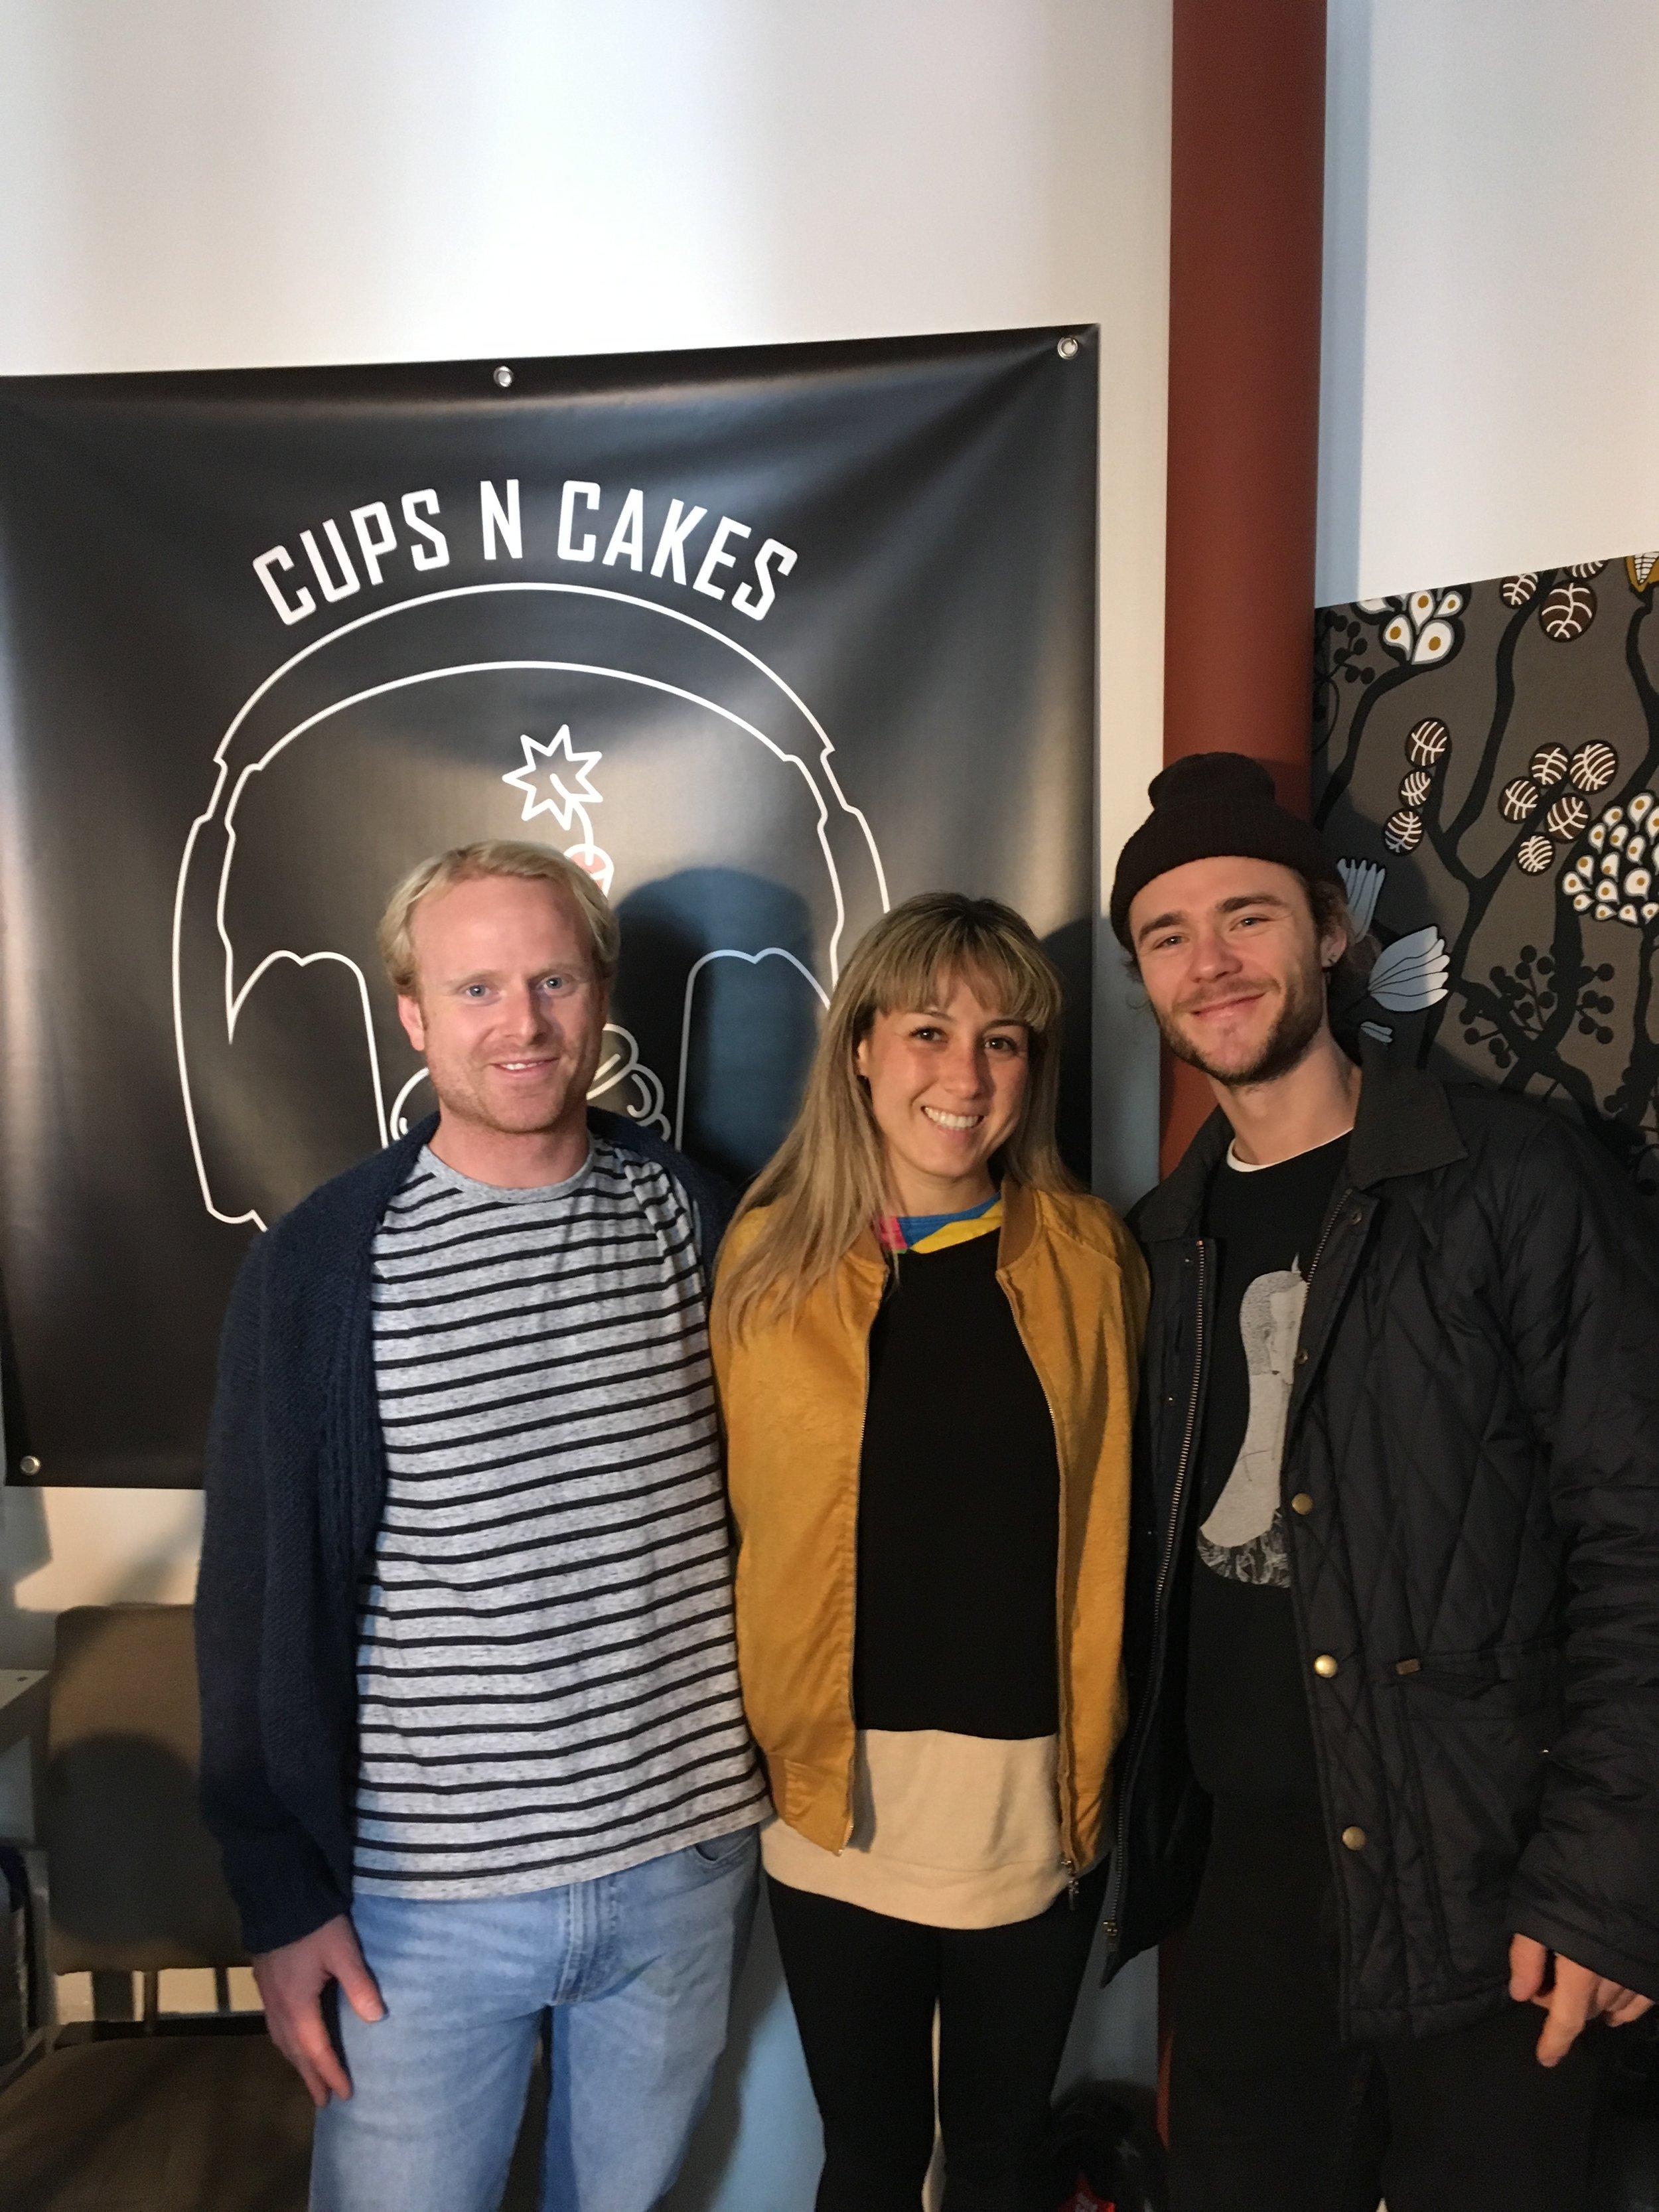 Will (Not in interview), Clea & Brock